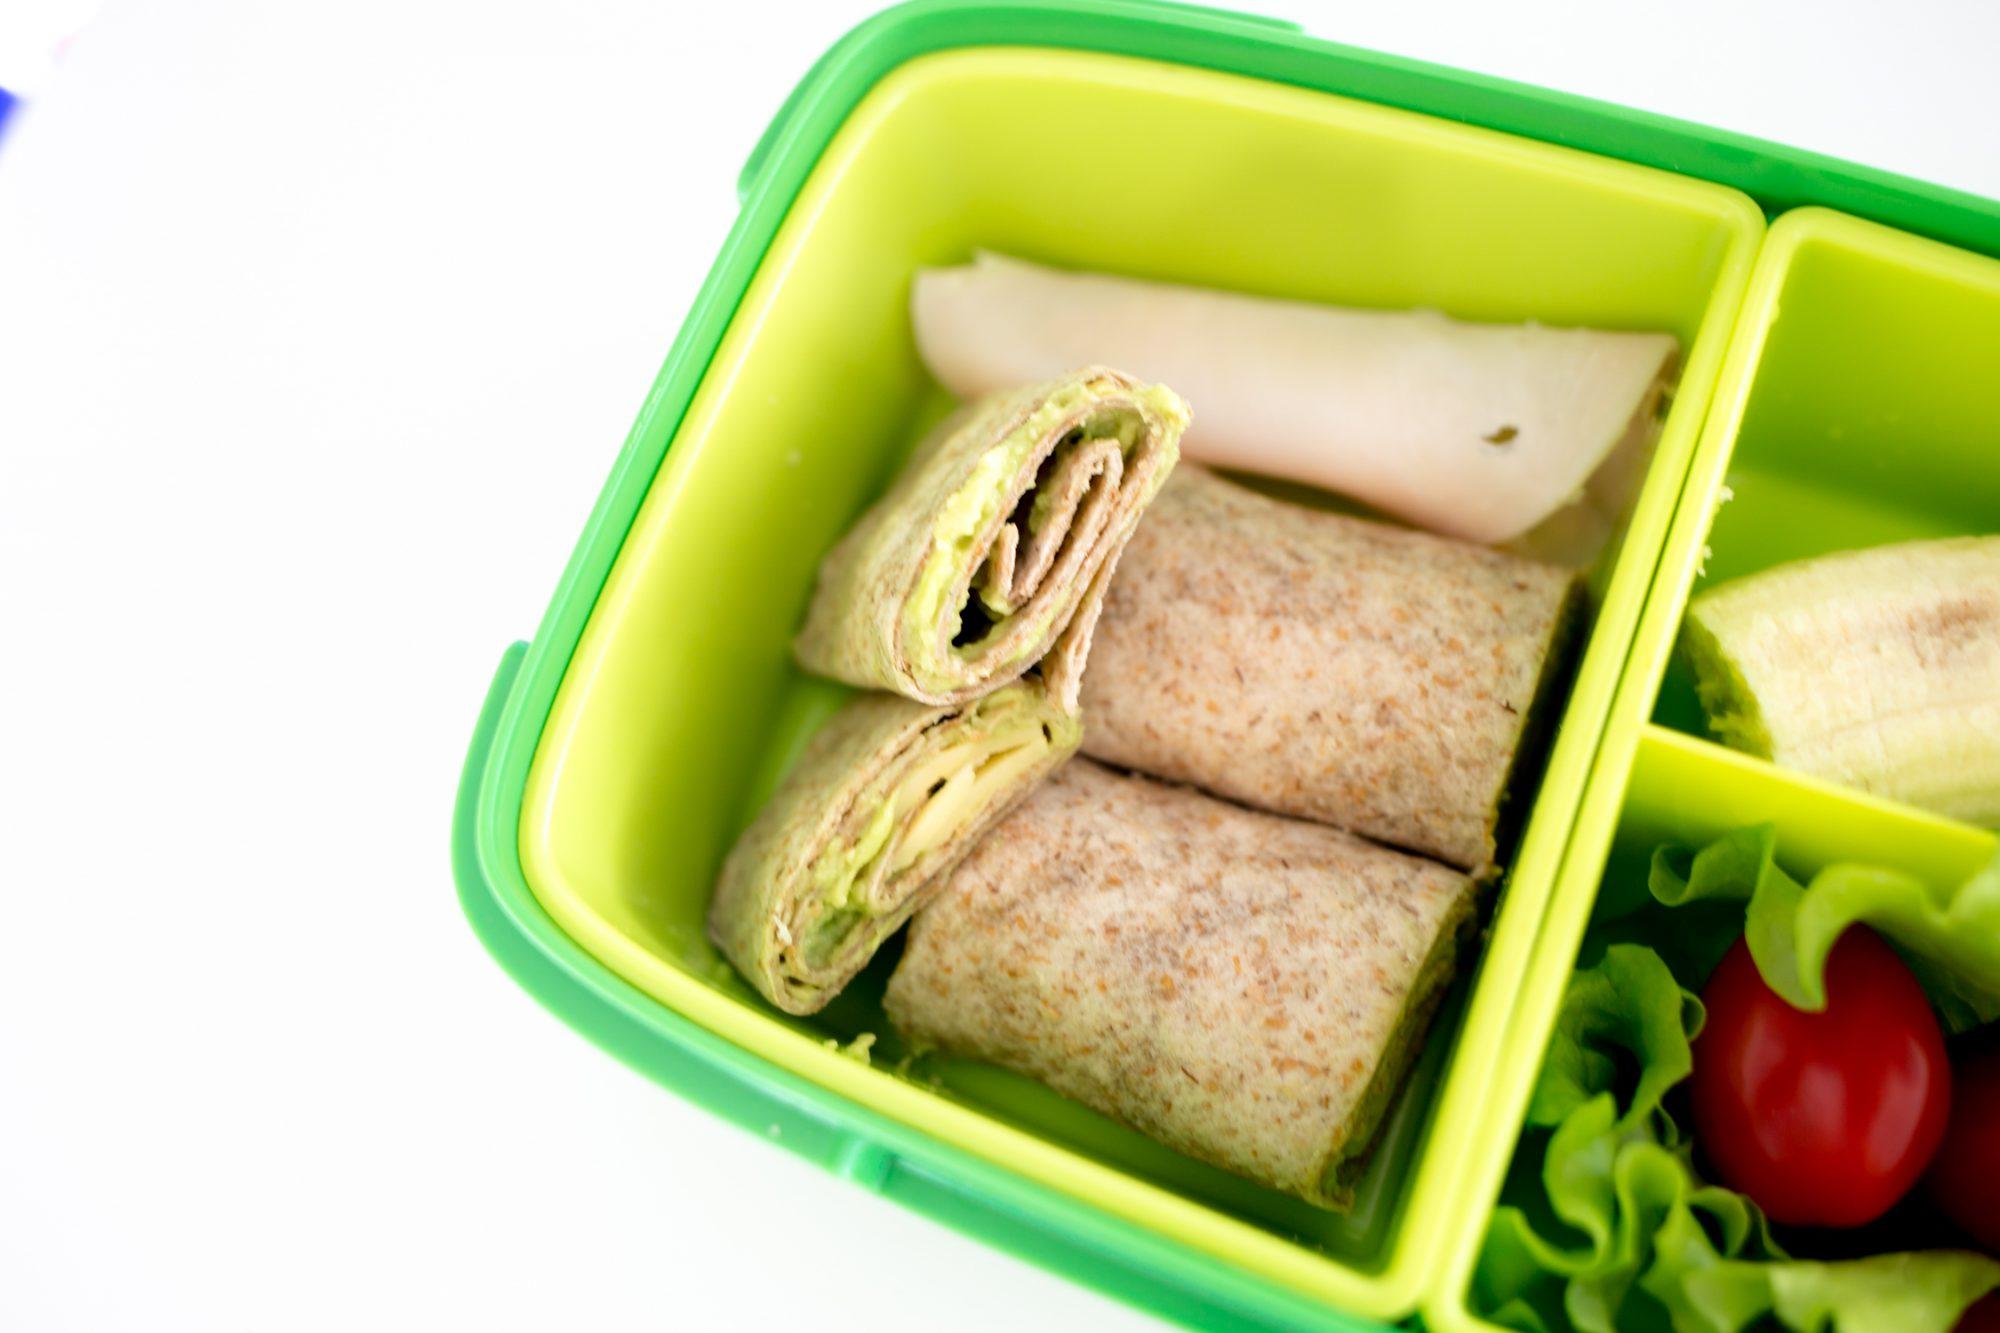 3 pomysły na drugie śniadanie do szkoły lub pracy